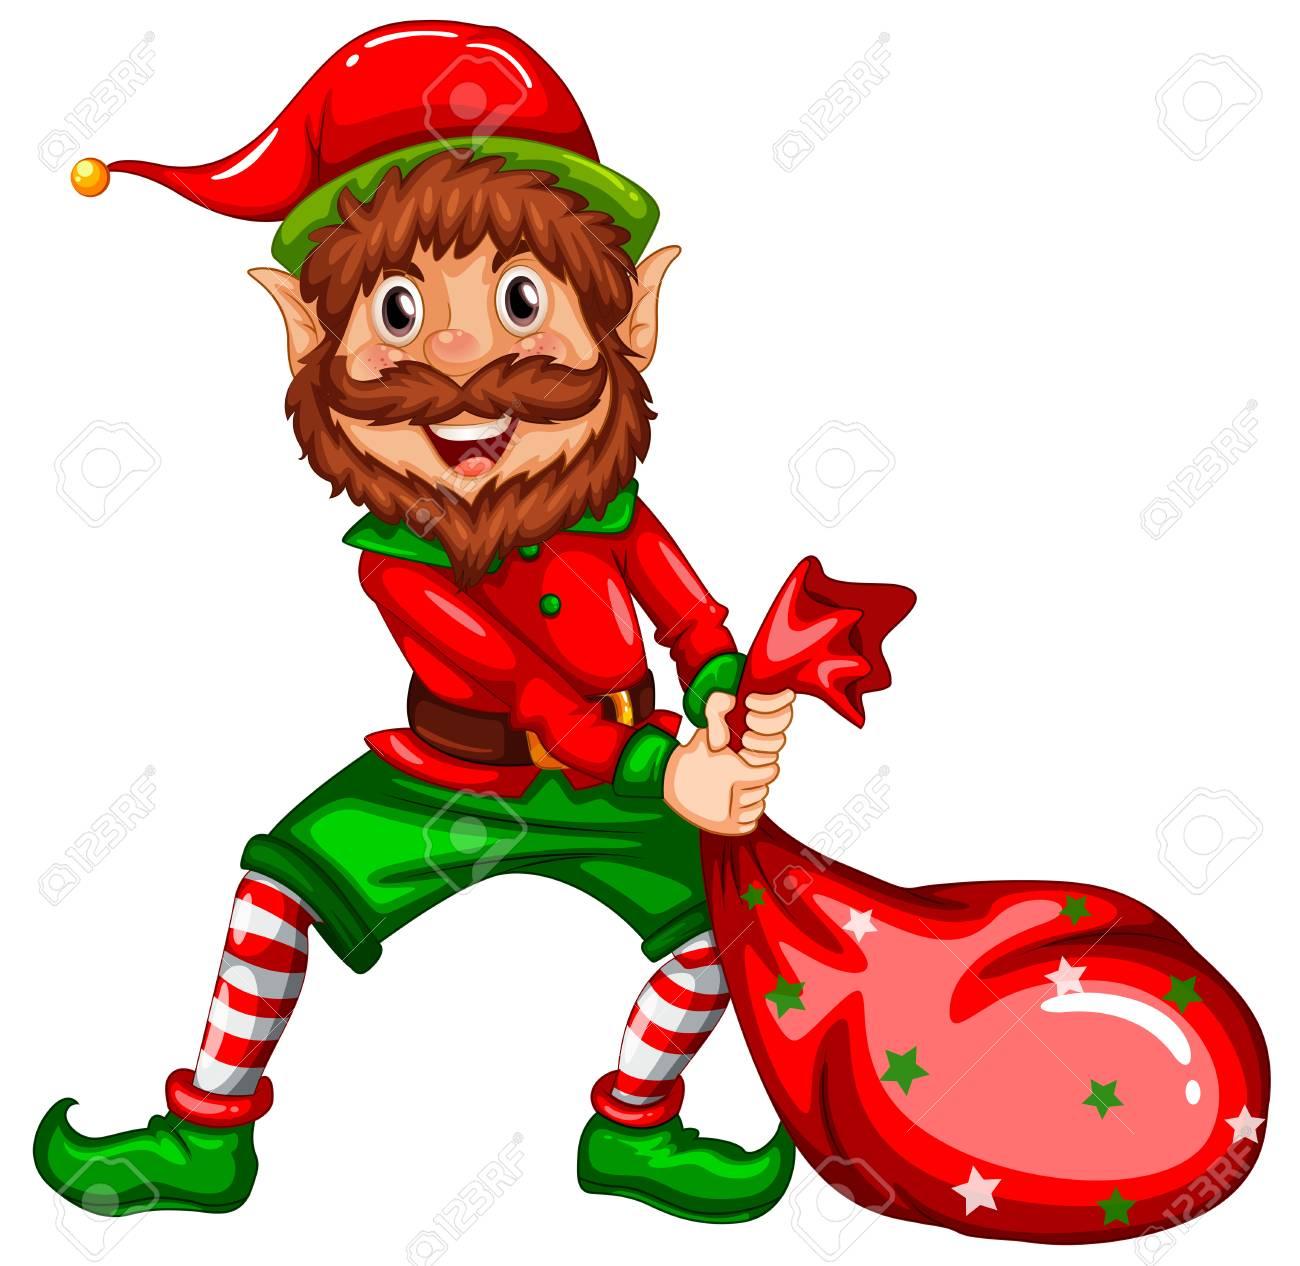 Happy elf carry sack illustration - 109933049